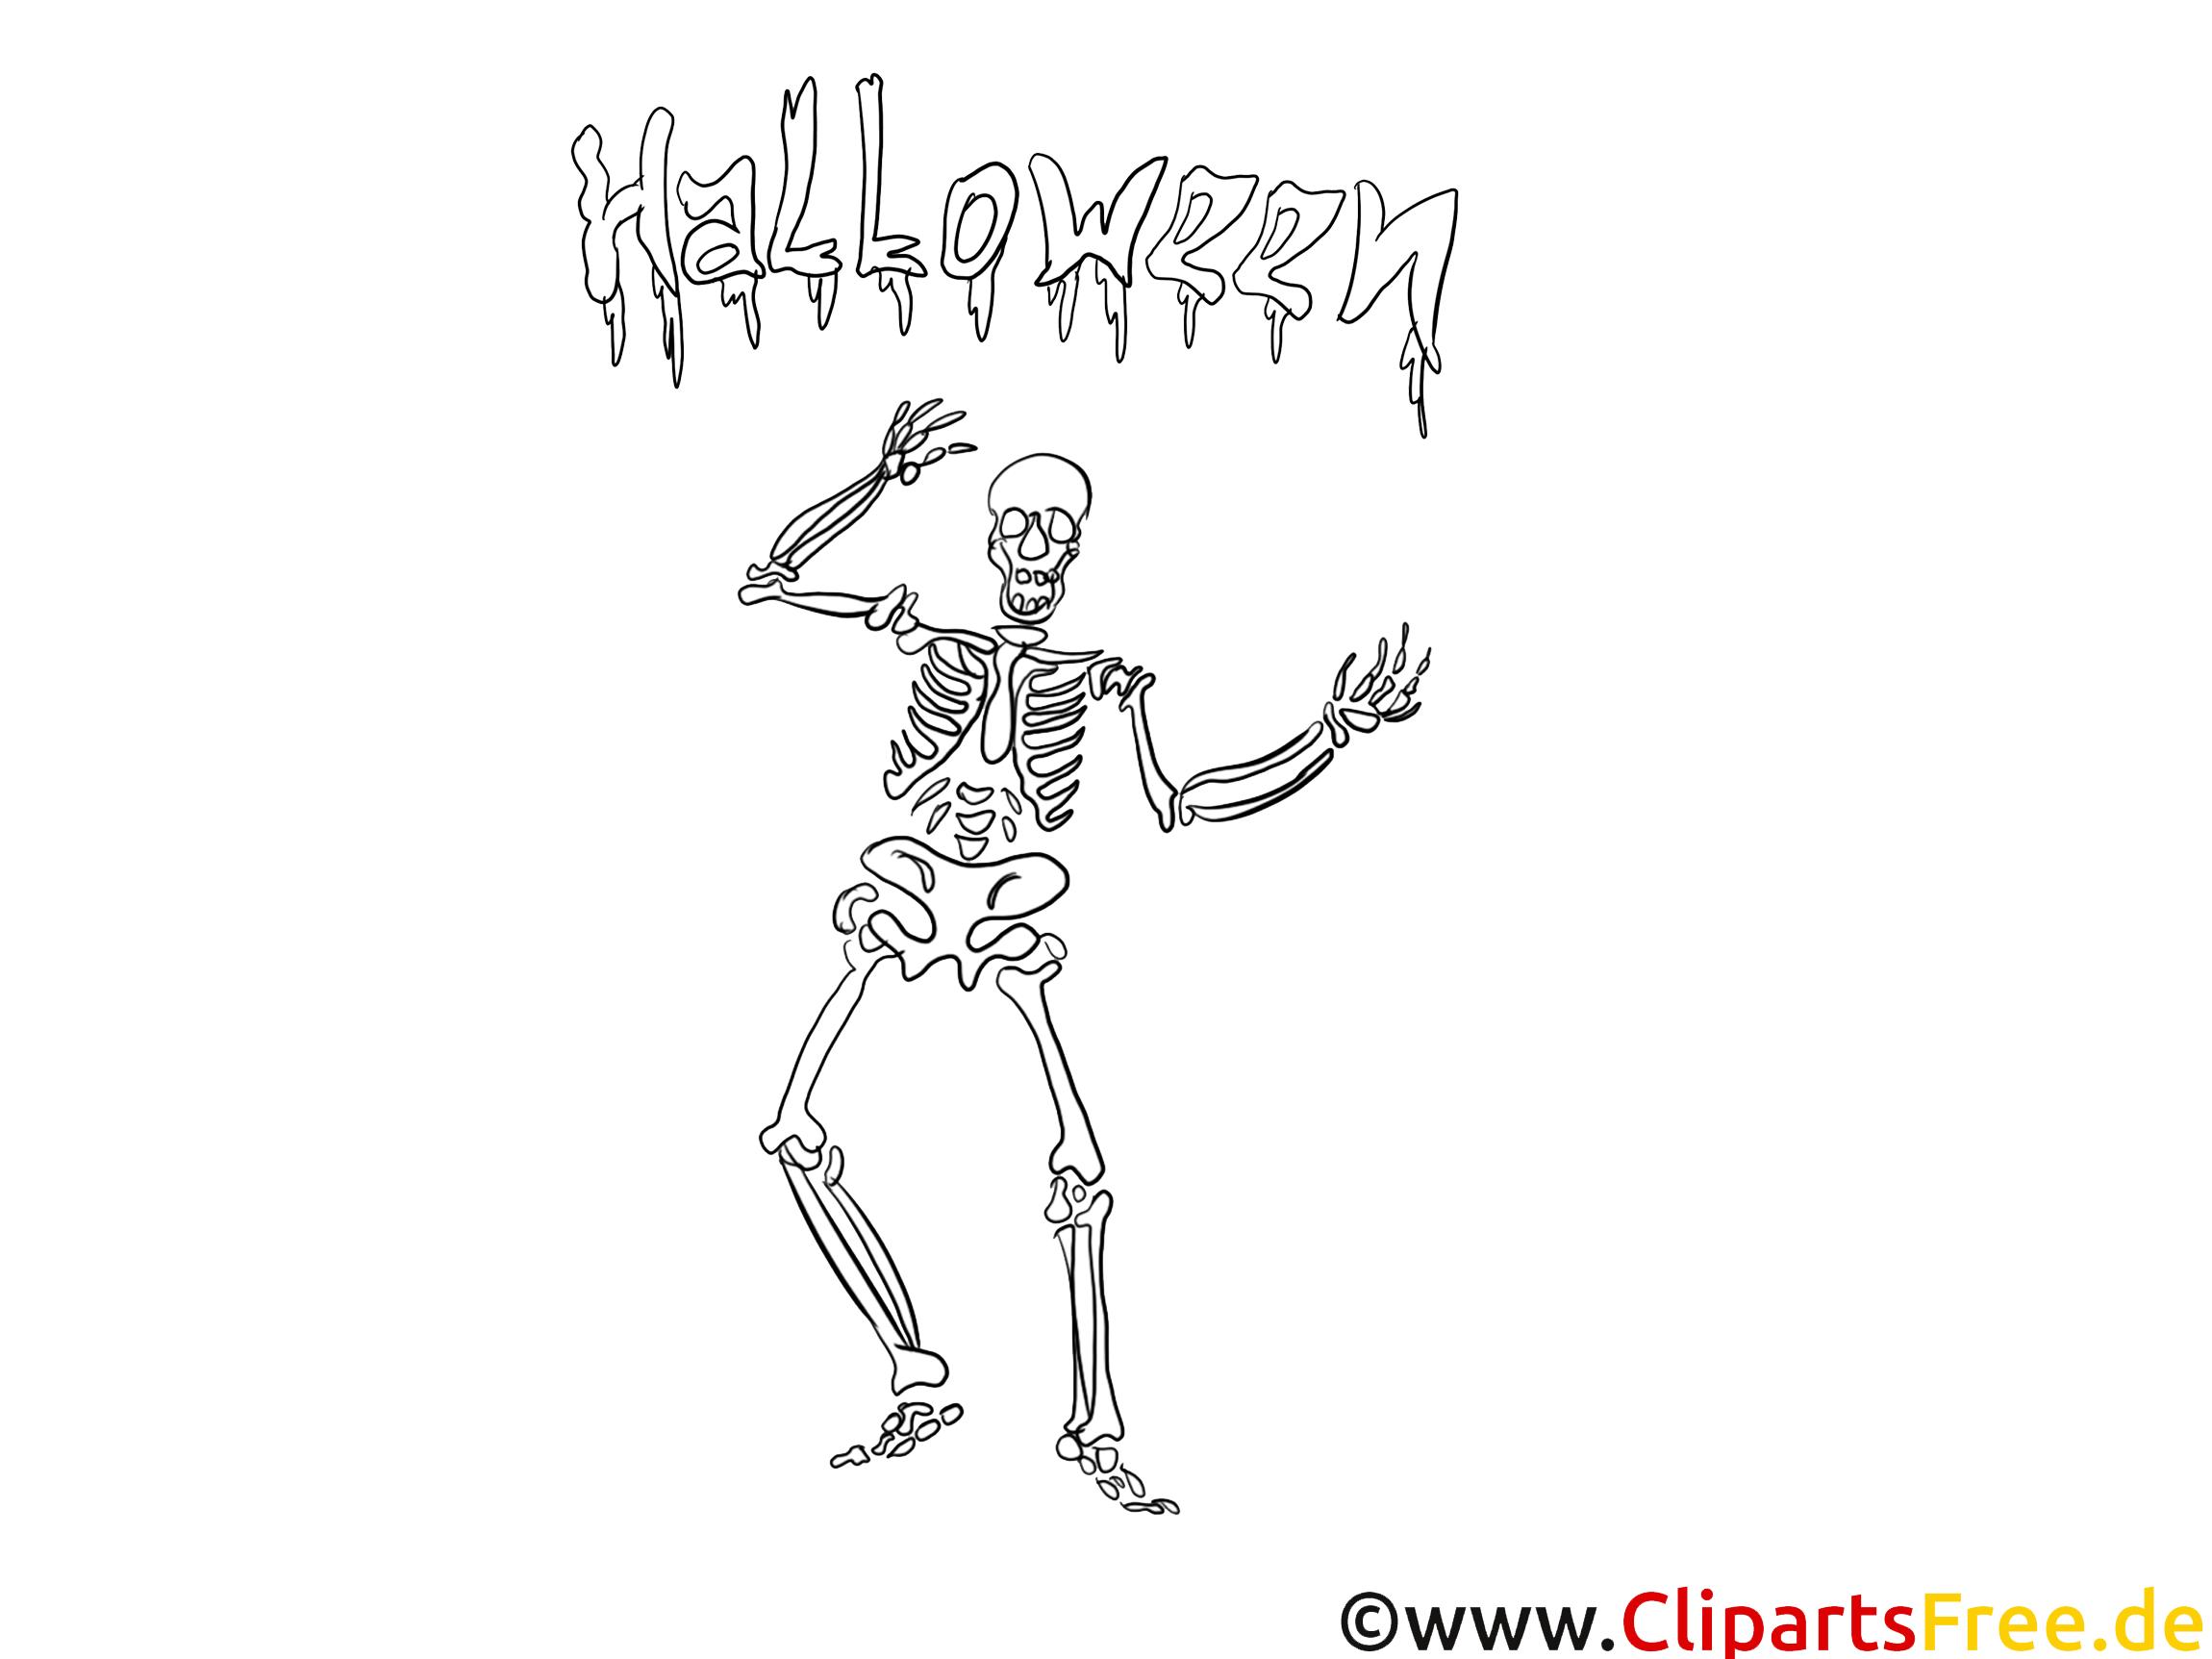 Squelette Dessin Halloween.Squelette Clipart Halloween Dessins à Colorier Halloween